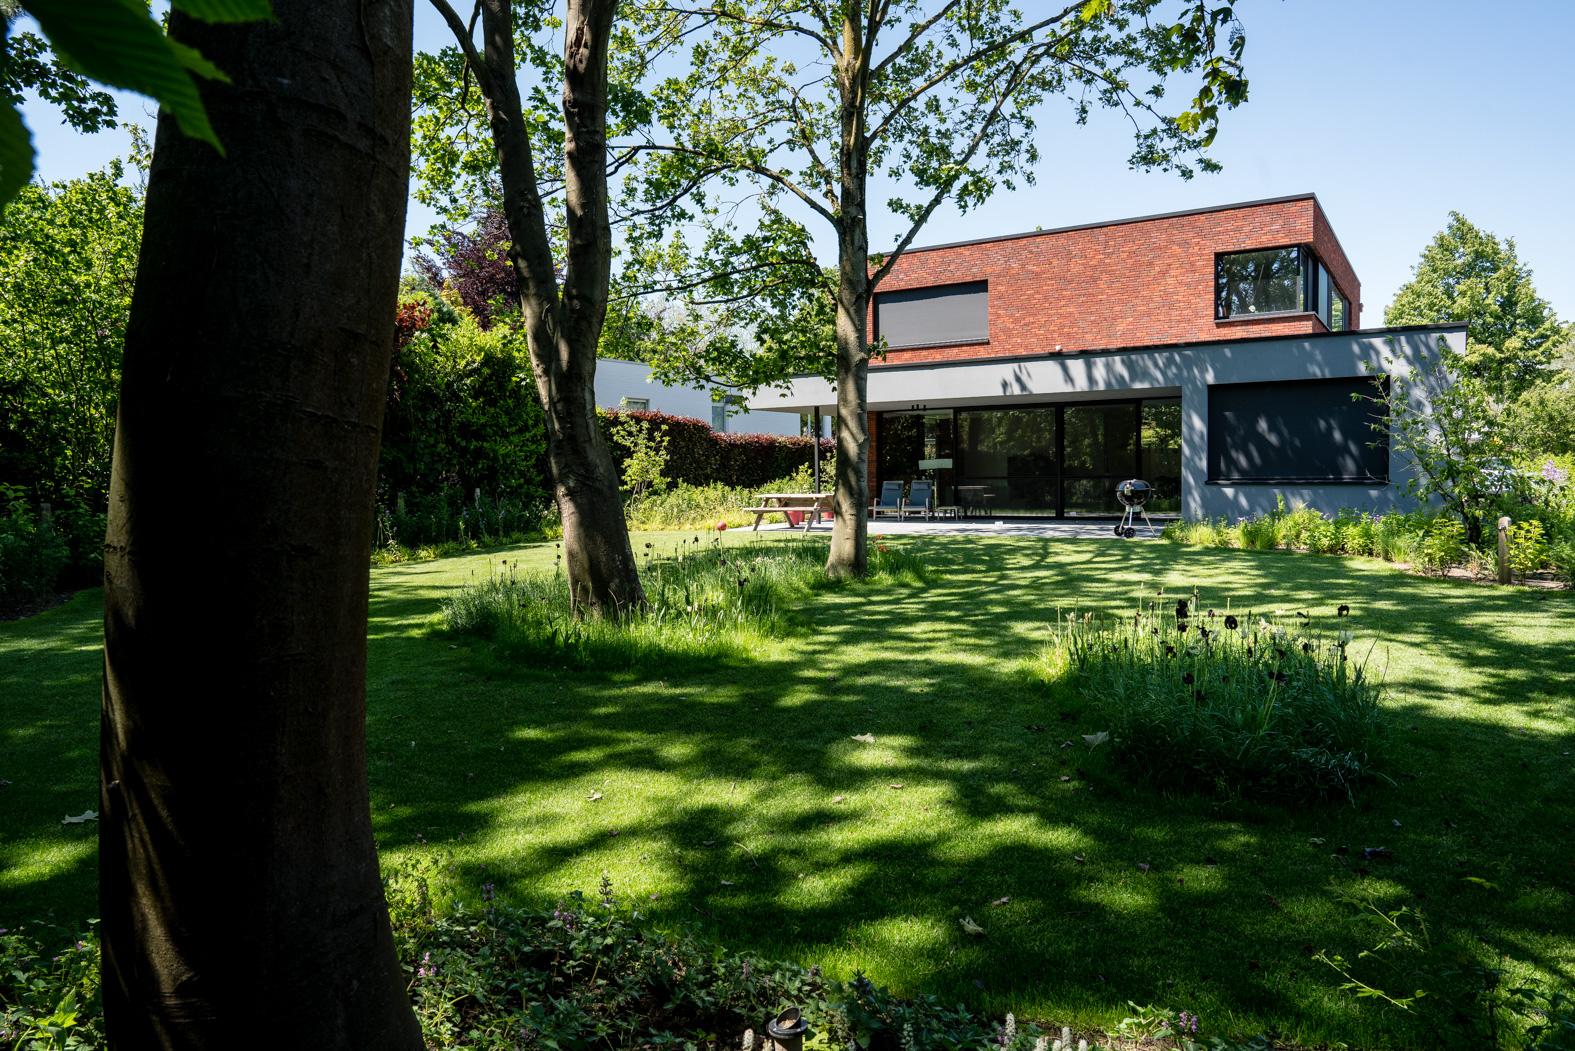 052021 WVV Hogerhuis U665 LOWRES27 | Baeyens & Beck architecten Gent | architect nieuwbouw renovatie interieur | high end | architectenbureau